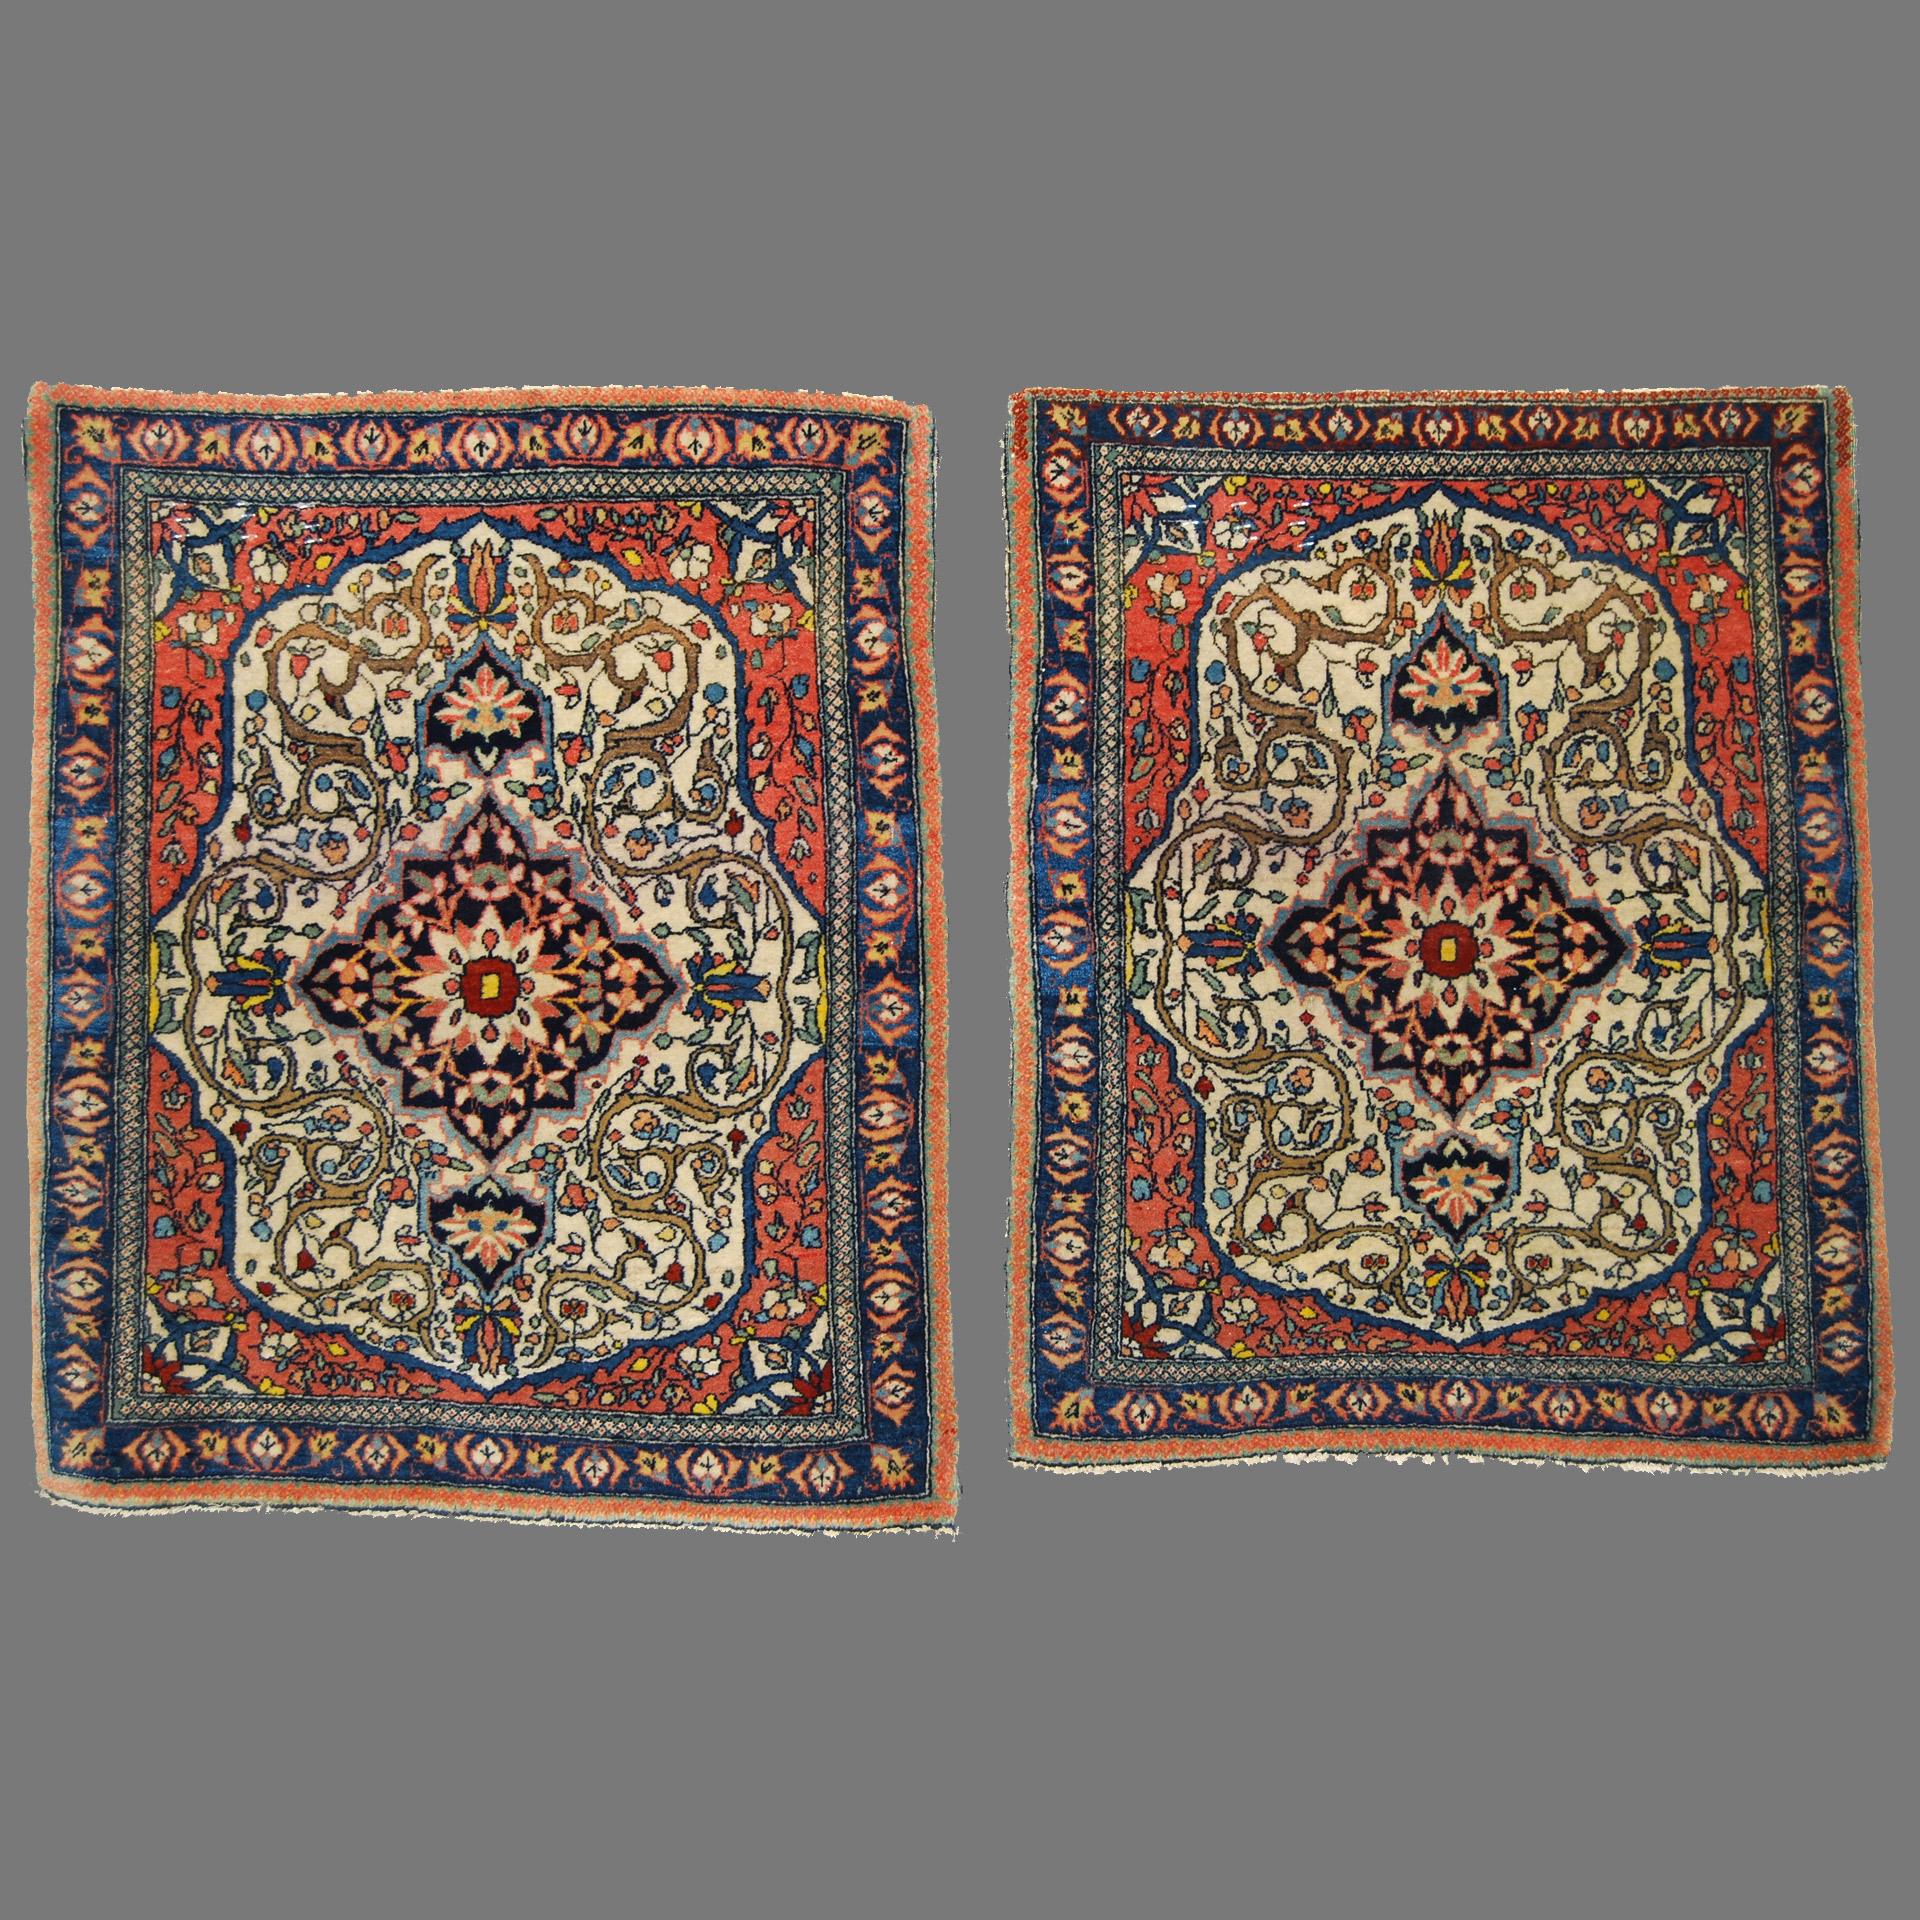 Pair of Antique Persian Mohtasham Kashan Rugs